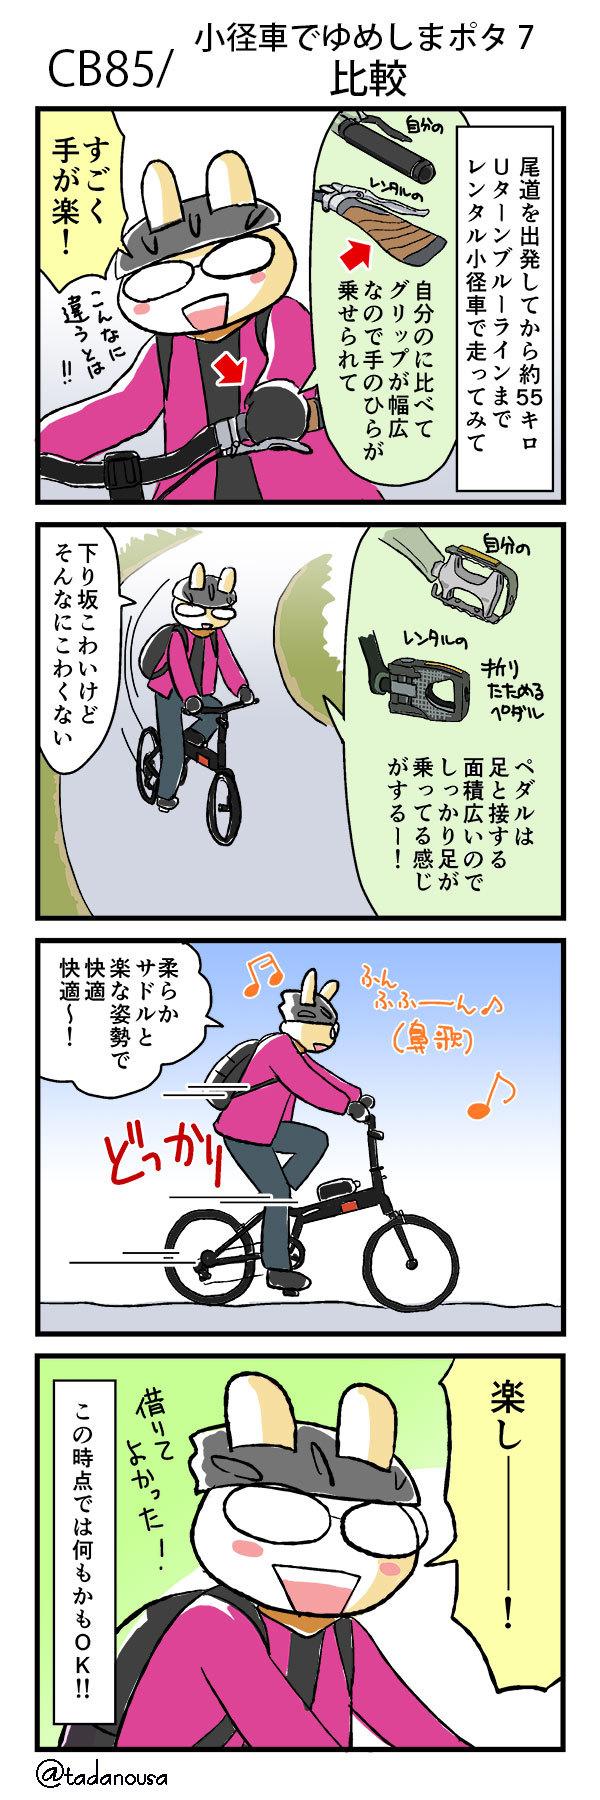 bike_4koma_kako125_2_s.jpg